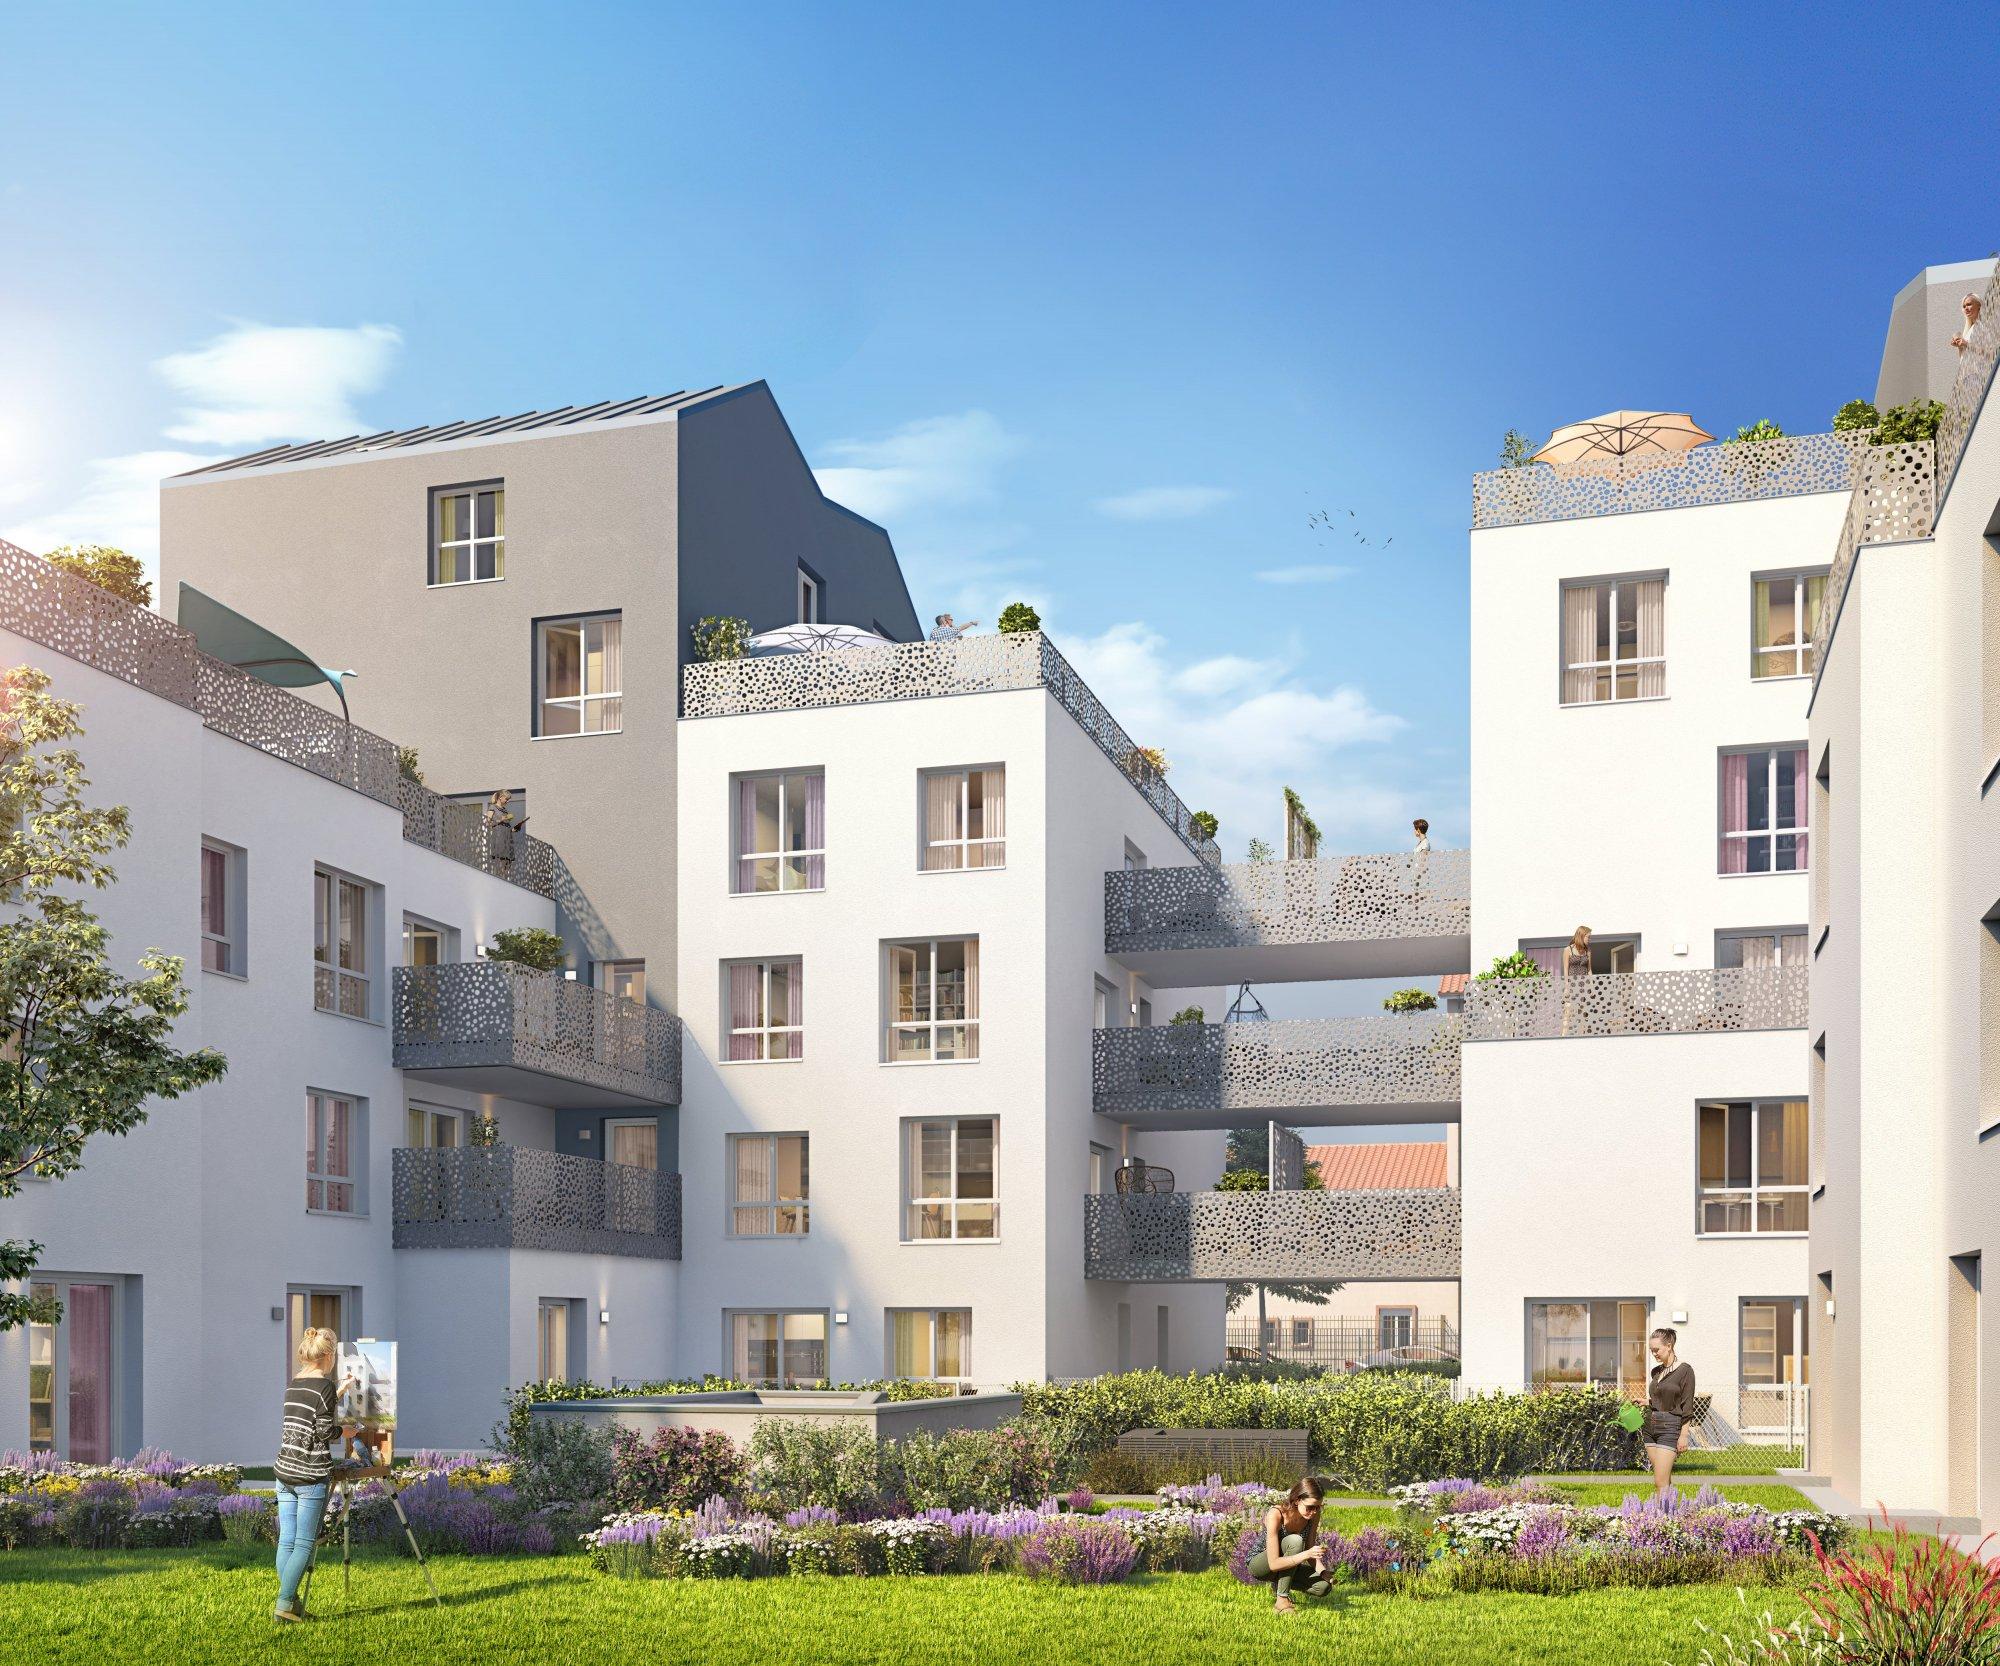 Programme immobilier Villeurbanne (69100) Résidence de standing MIP2